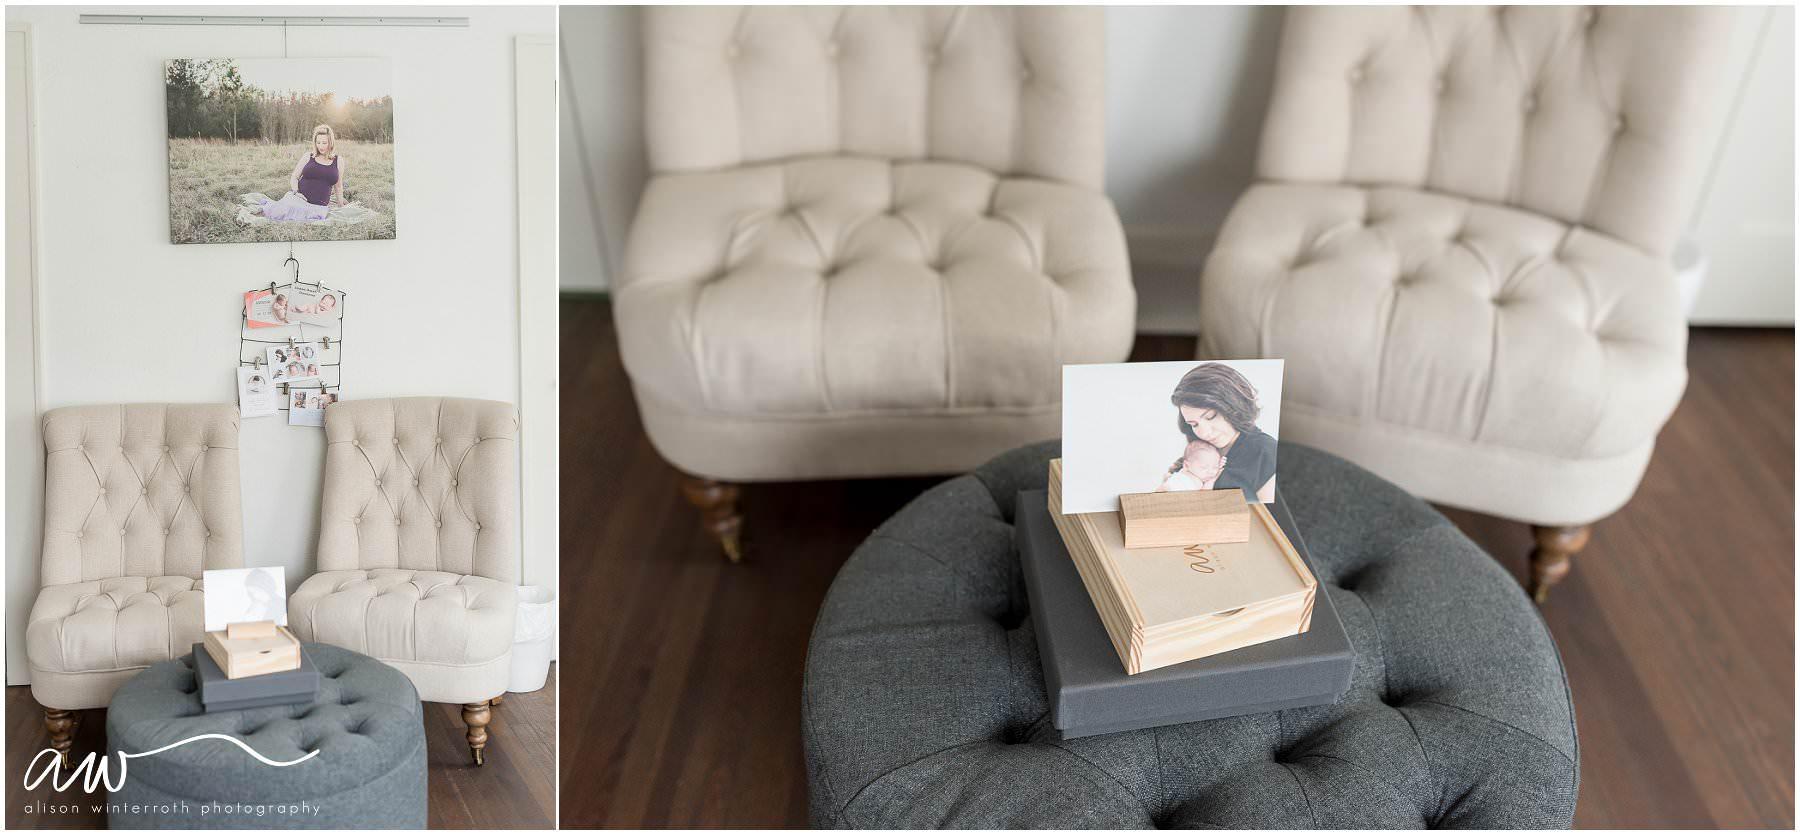 Linen chairs in newborn studio